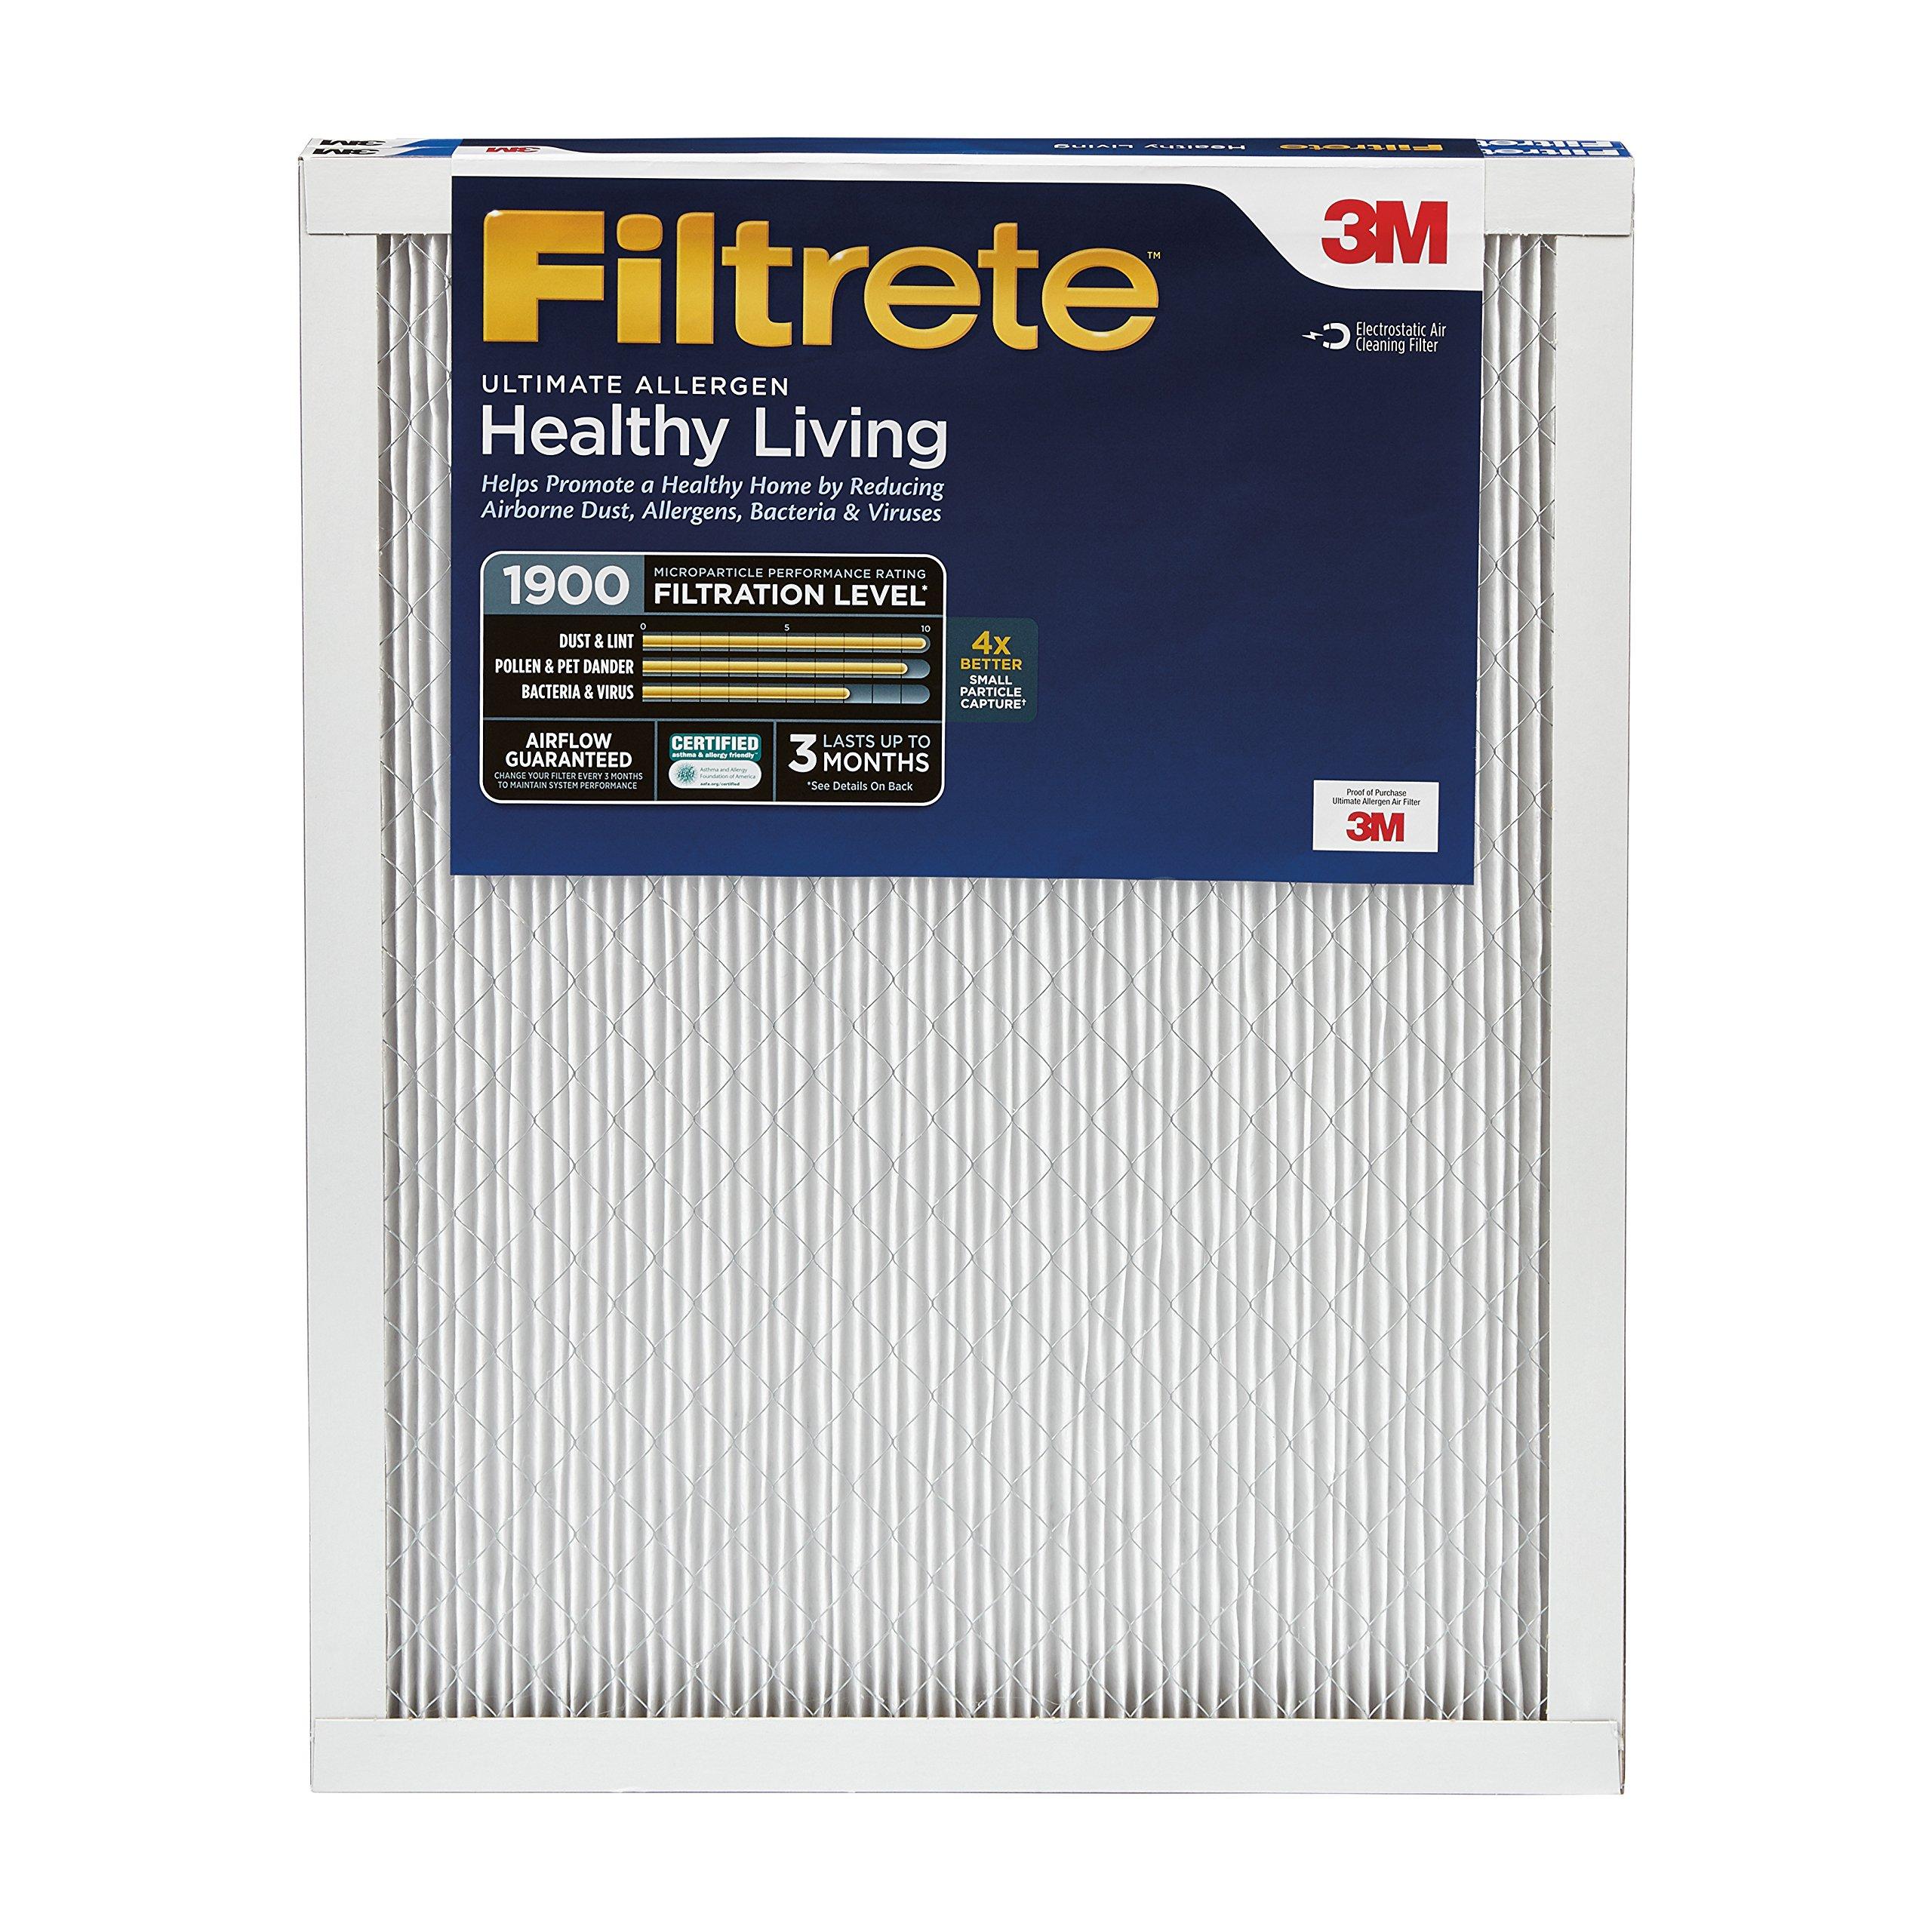 Filtrete 20x25x1, AC Furnace Air Filter, MPR 1900, Healthy Living Ultimate Allergen, 2-Pack